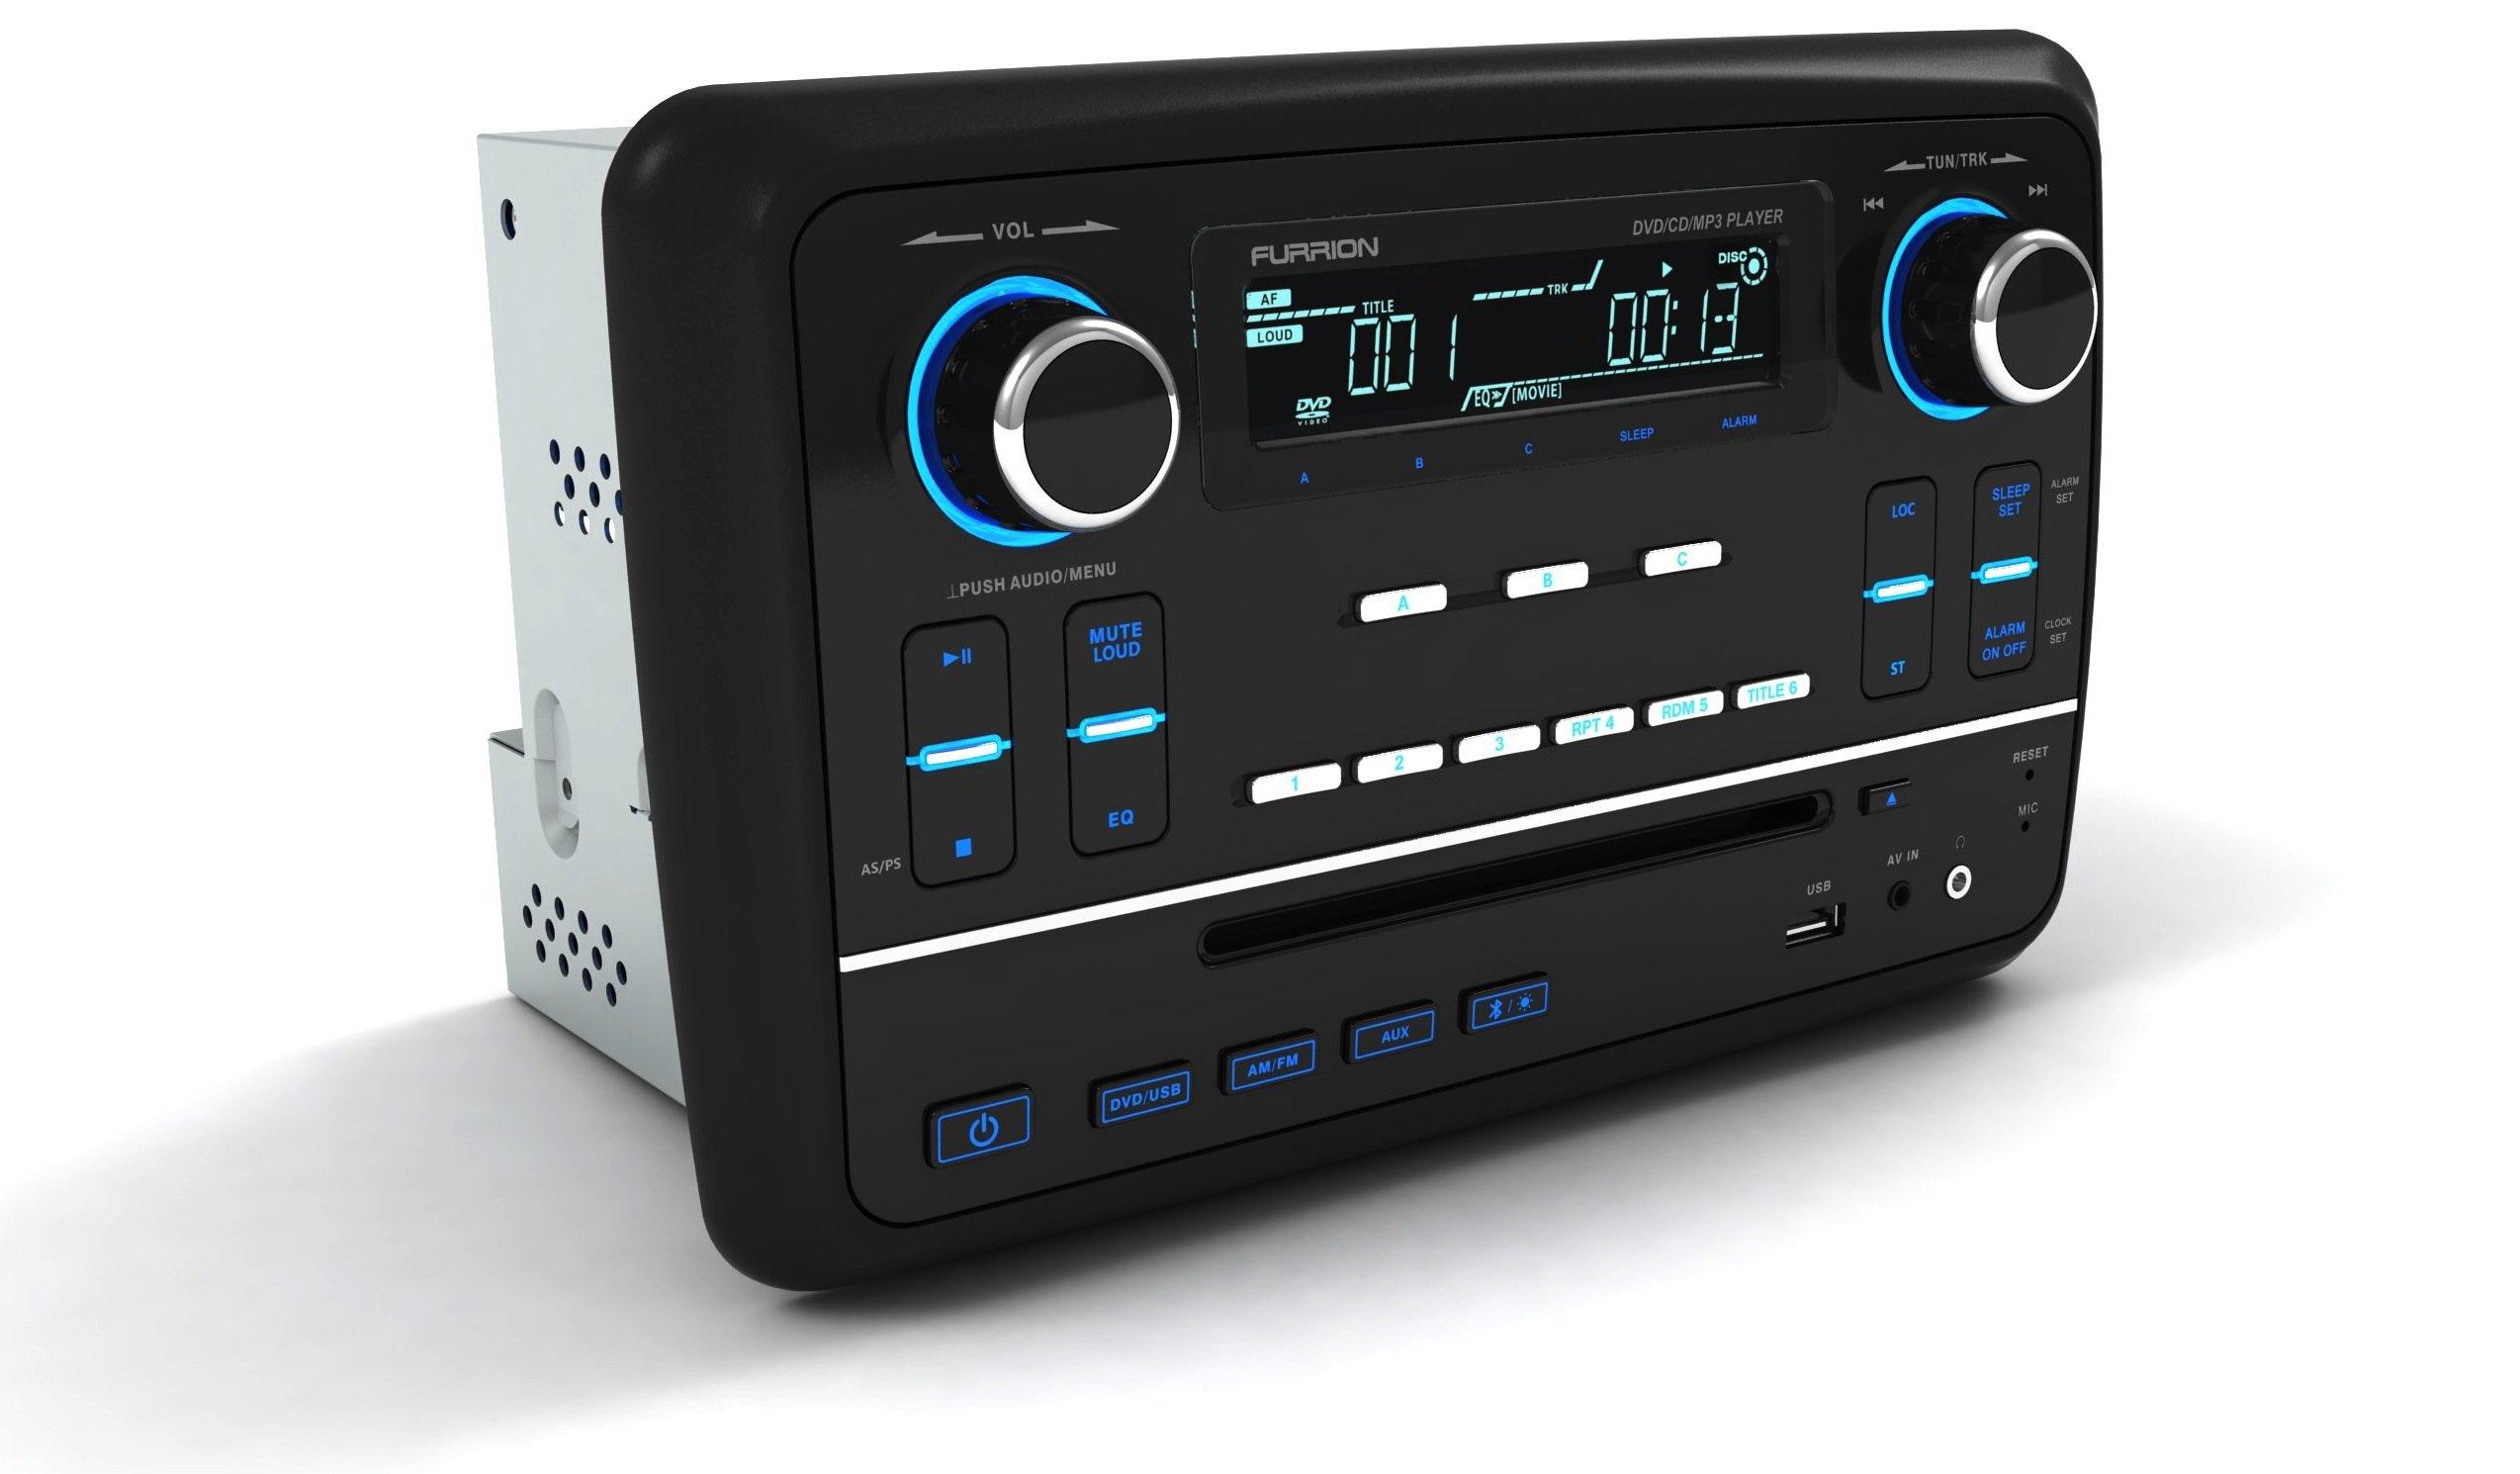 Furrion Dv1200 Wall Mount Bluetooth And Hdmi Rv Stereo Ebay